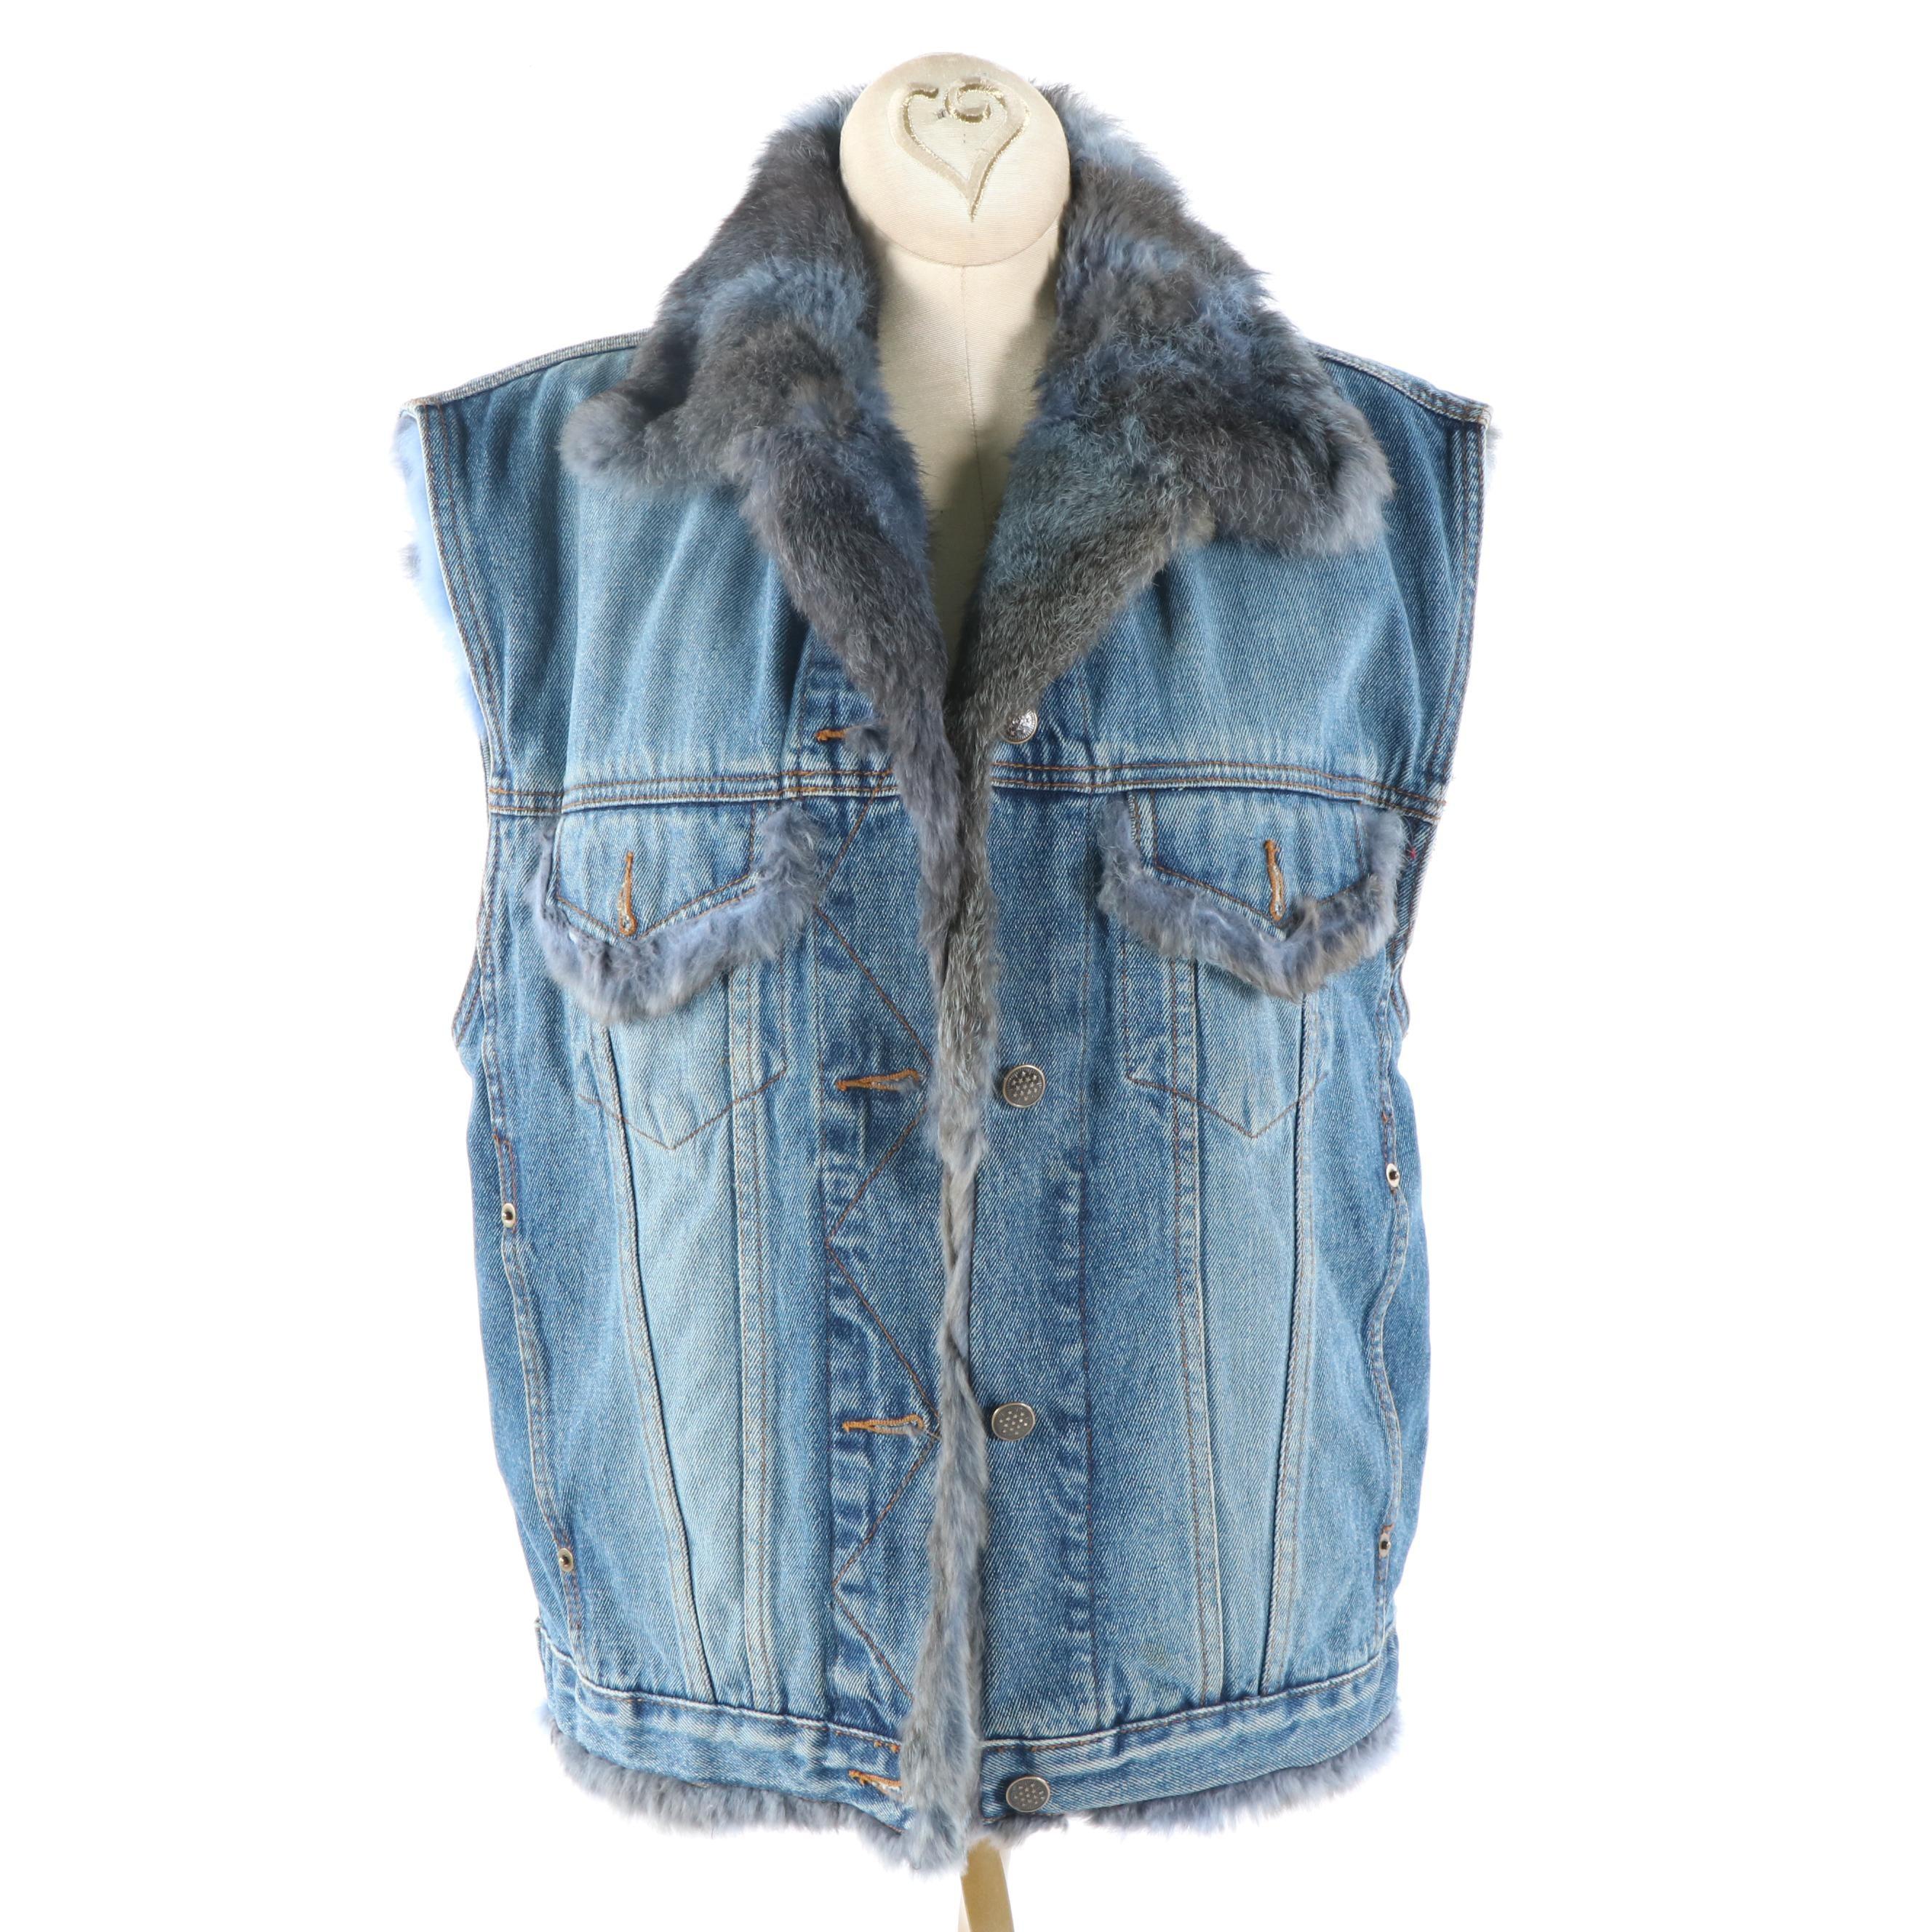 Women's Denim Vest with Dyed Rabbit Fur Lining